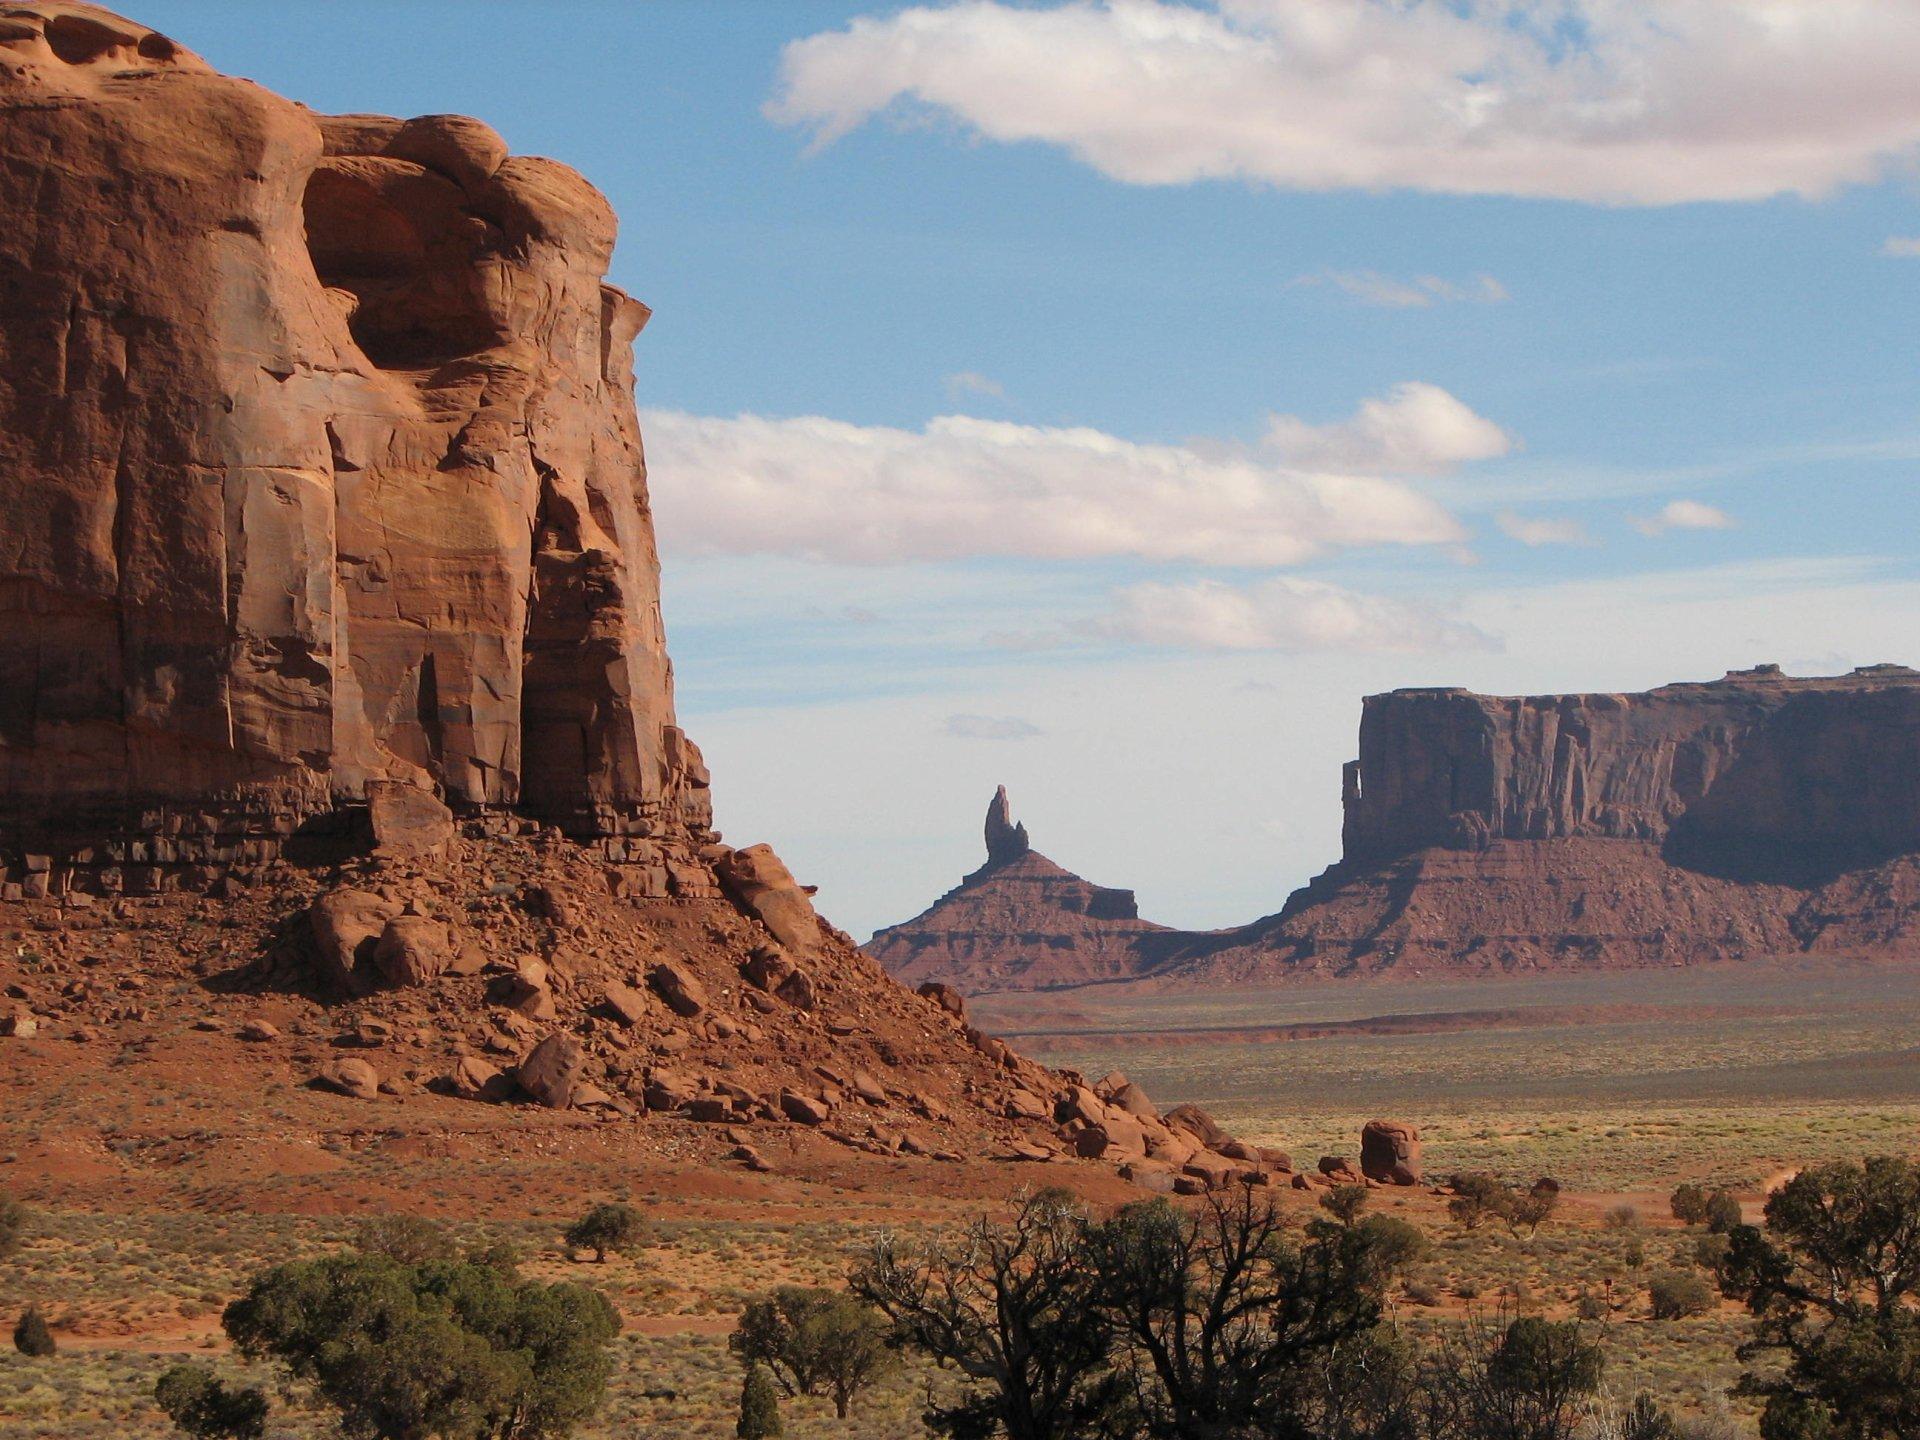 Monument Valley, Arizona-Utah State Line HD Wallpaper